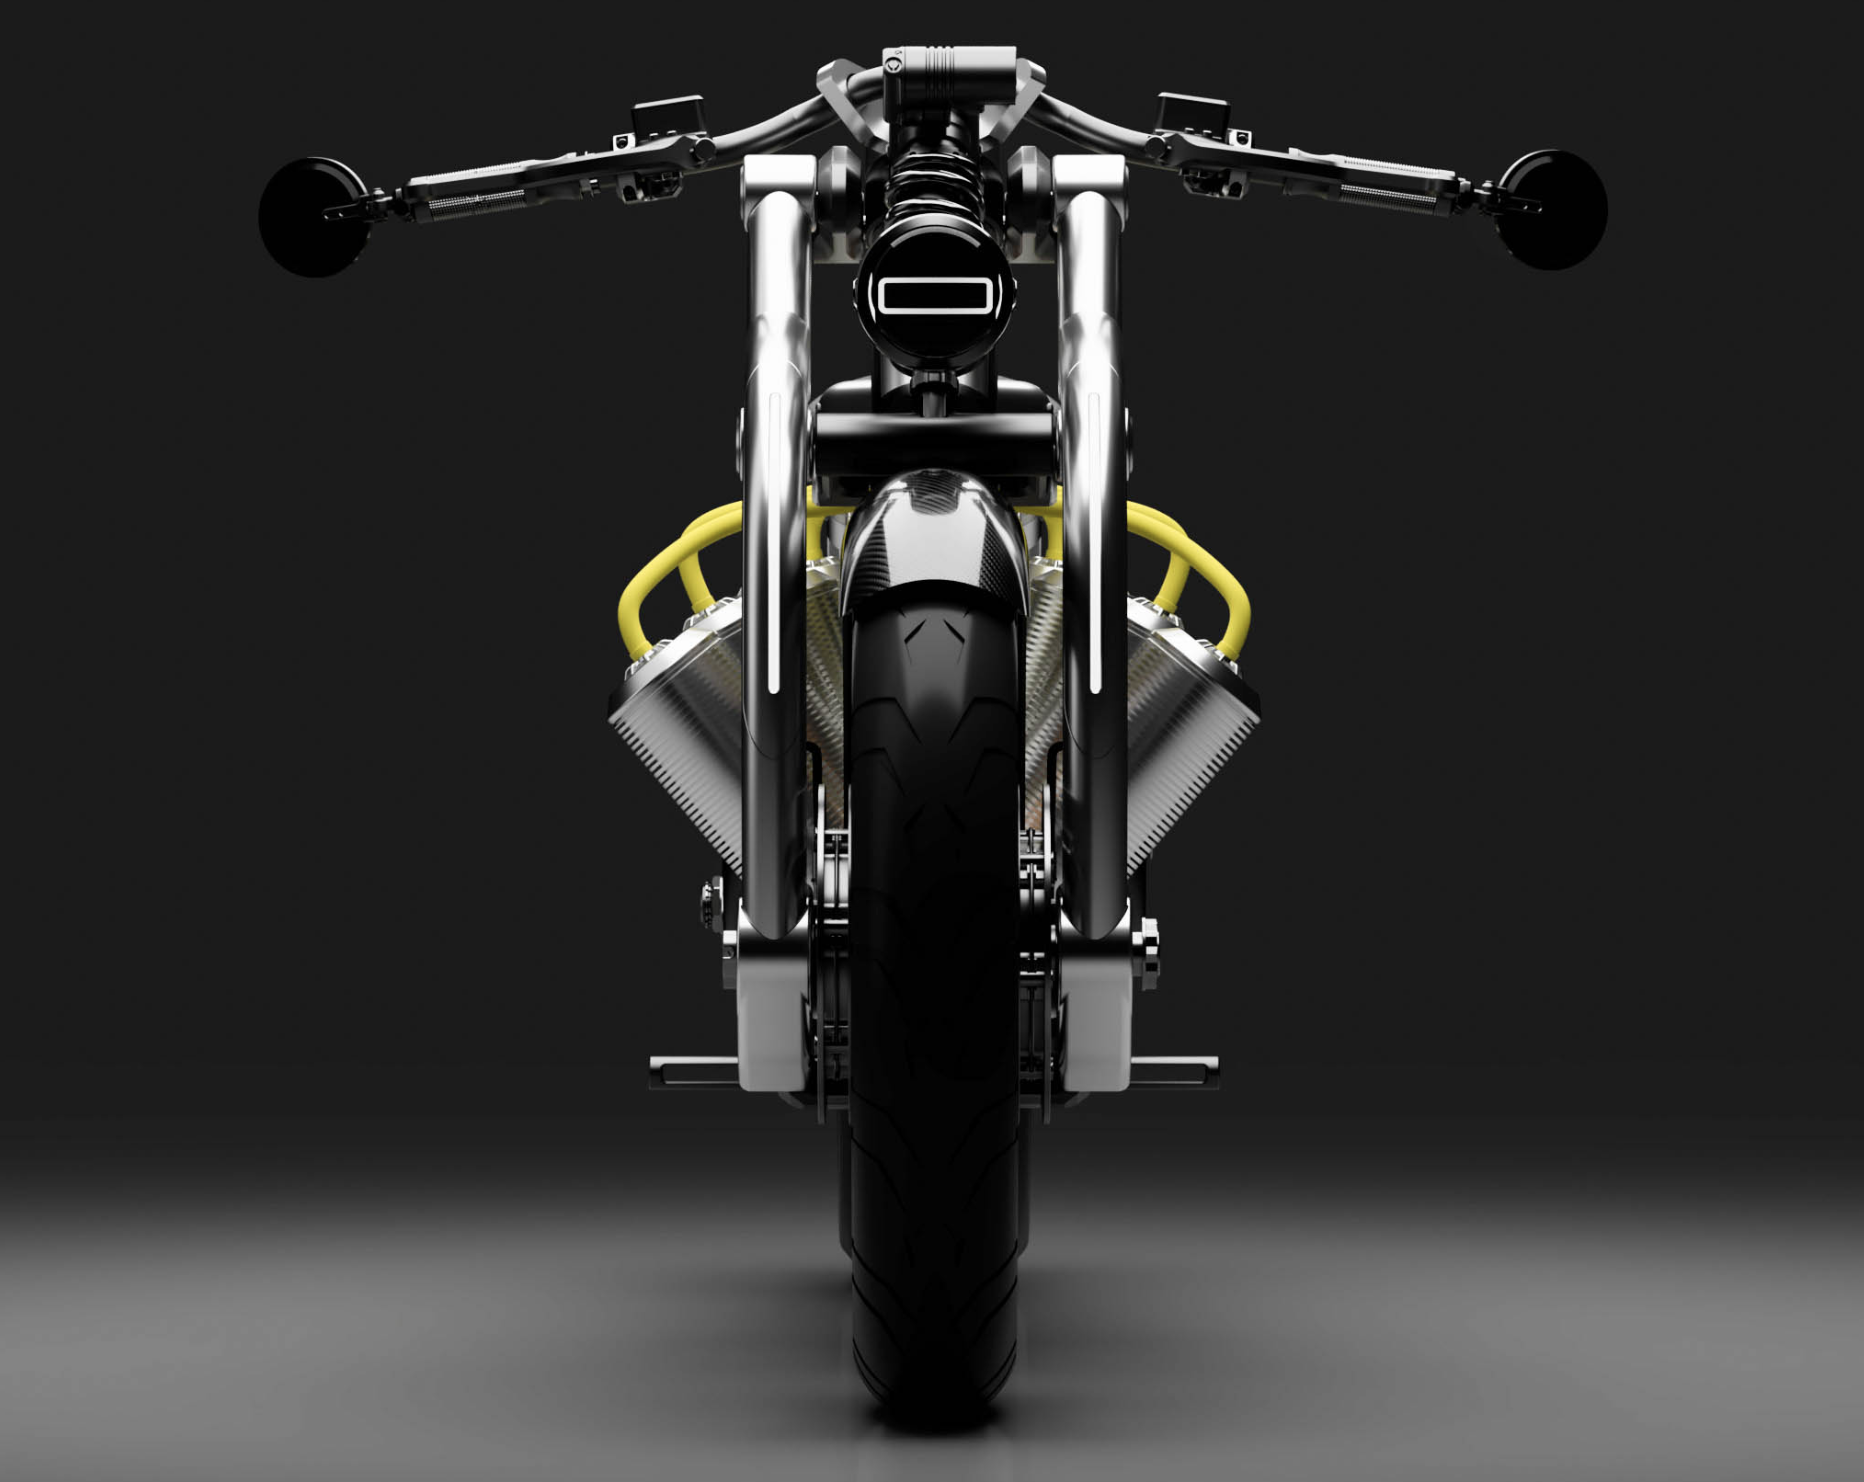 Predok motocyklu Curtiss Zeus